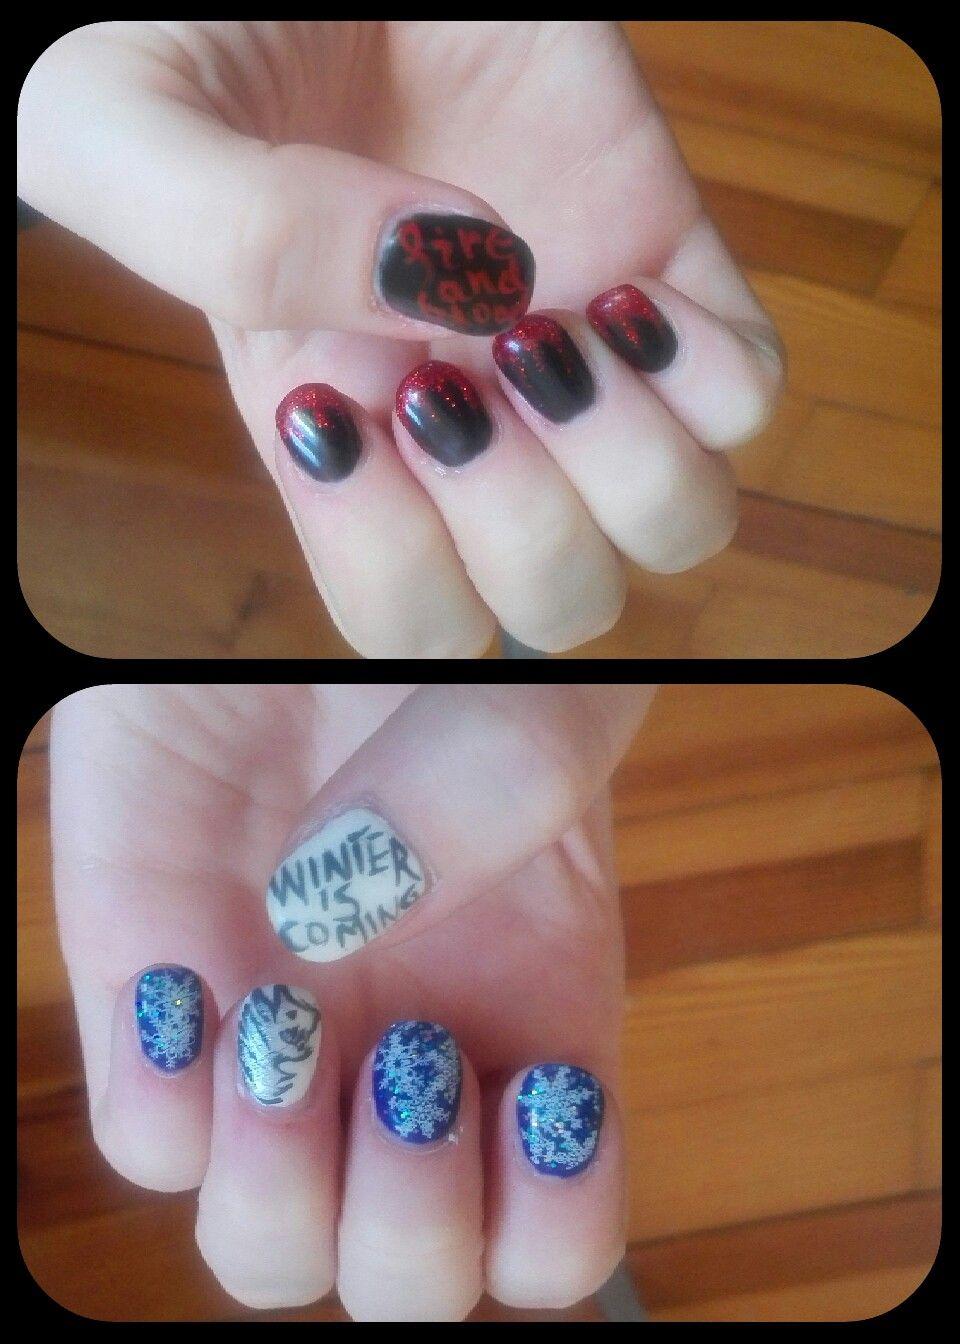 Game of thrones nails Stark&Tagaryen | Game of Thrones Nails | Pinterest